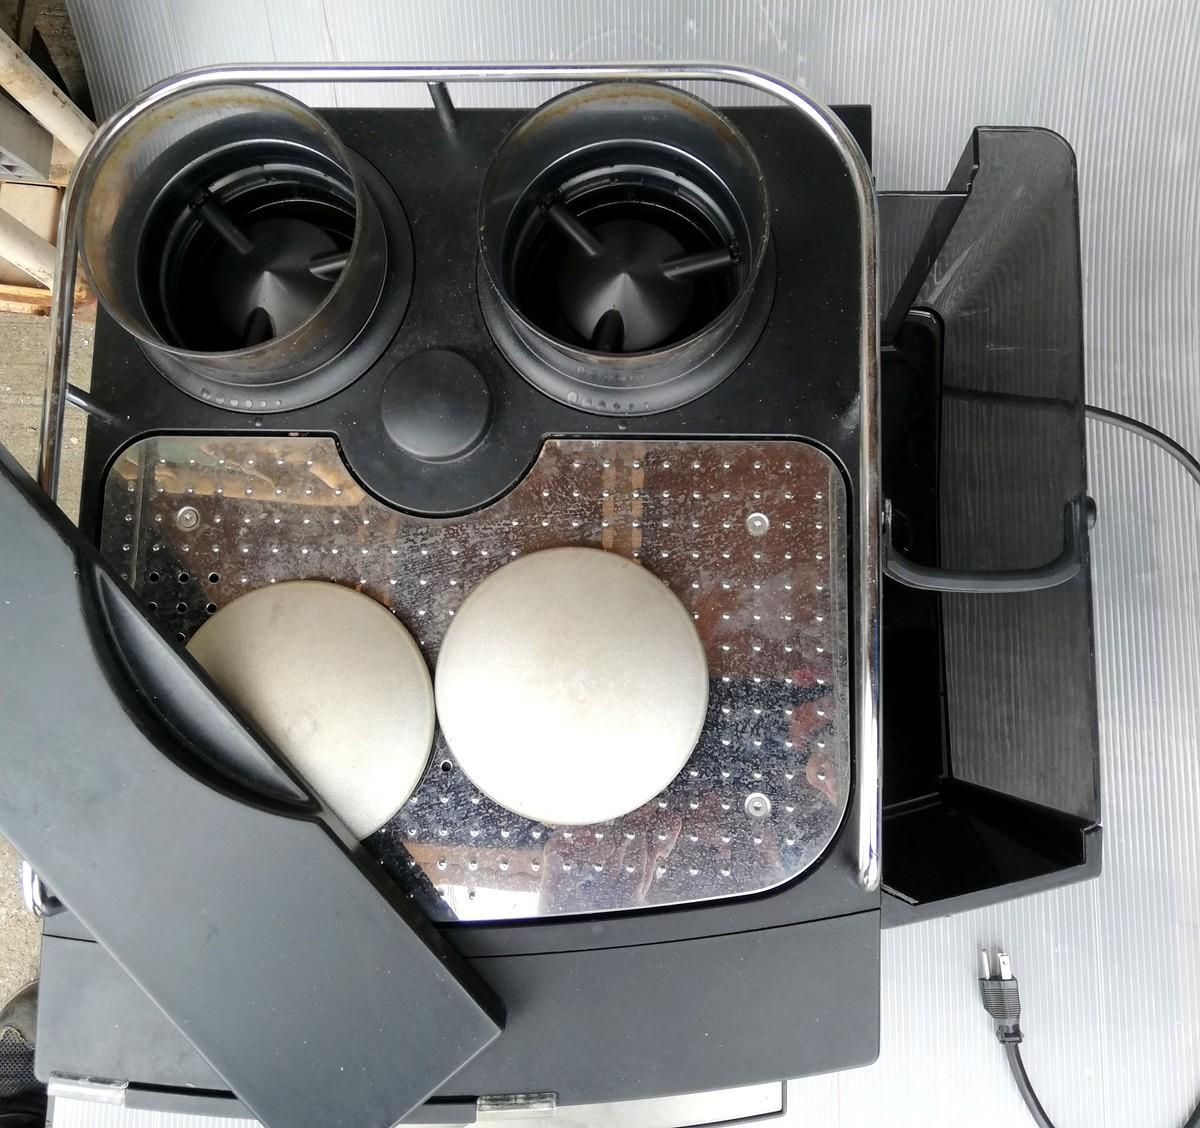 FR-1◆FRANKE フランケ Typ654 エスプレッソマシン 100V 通電確認済 コーヒーマシン / BONMAC BM-FAF1 ★引取歓迎(大阪)_画像9